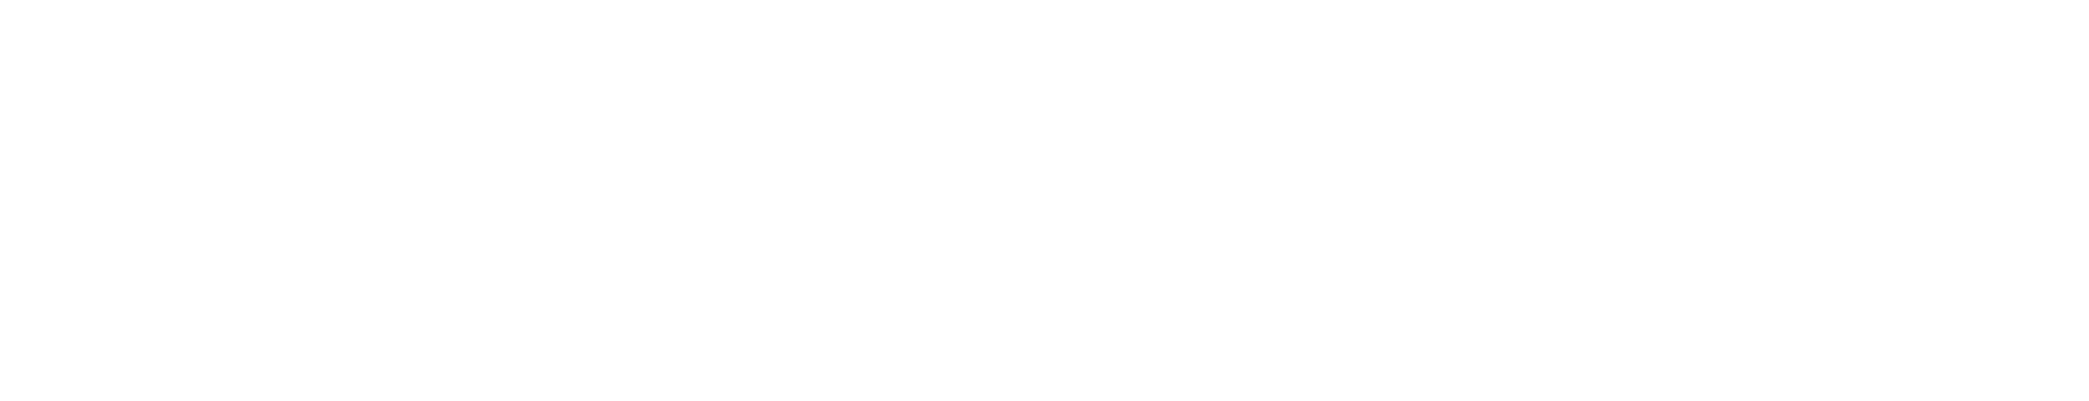 Salper SL